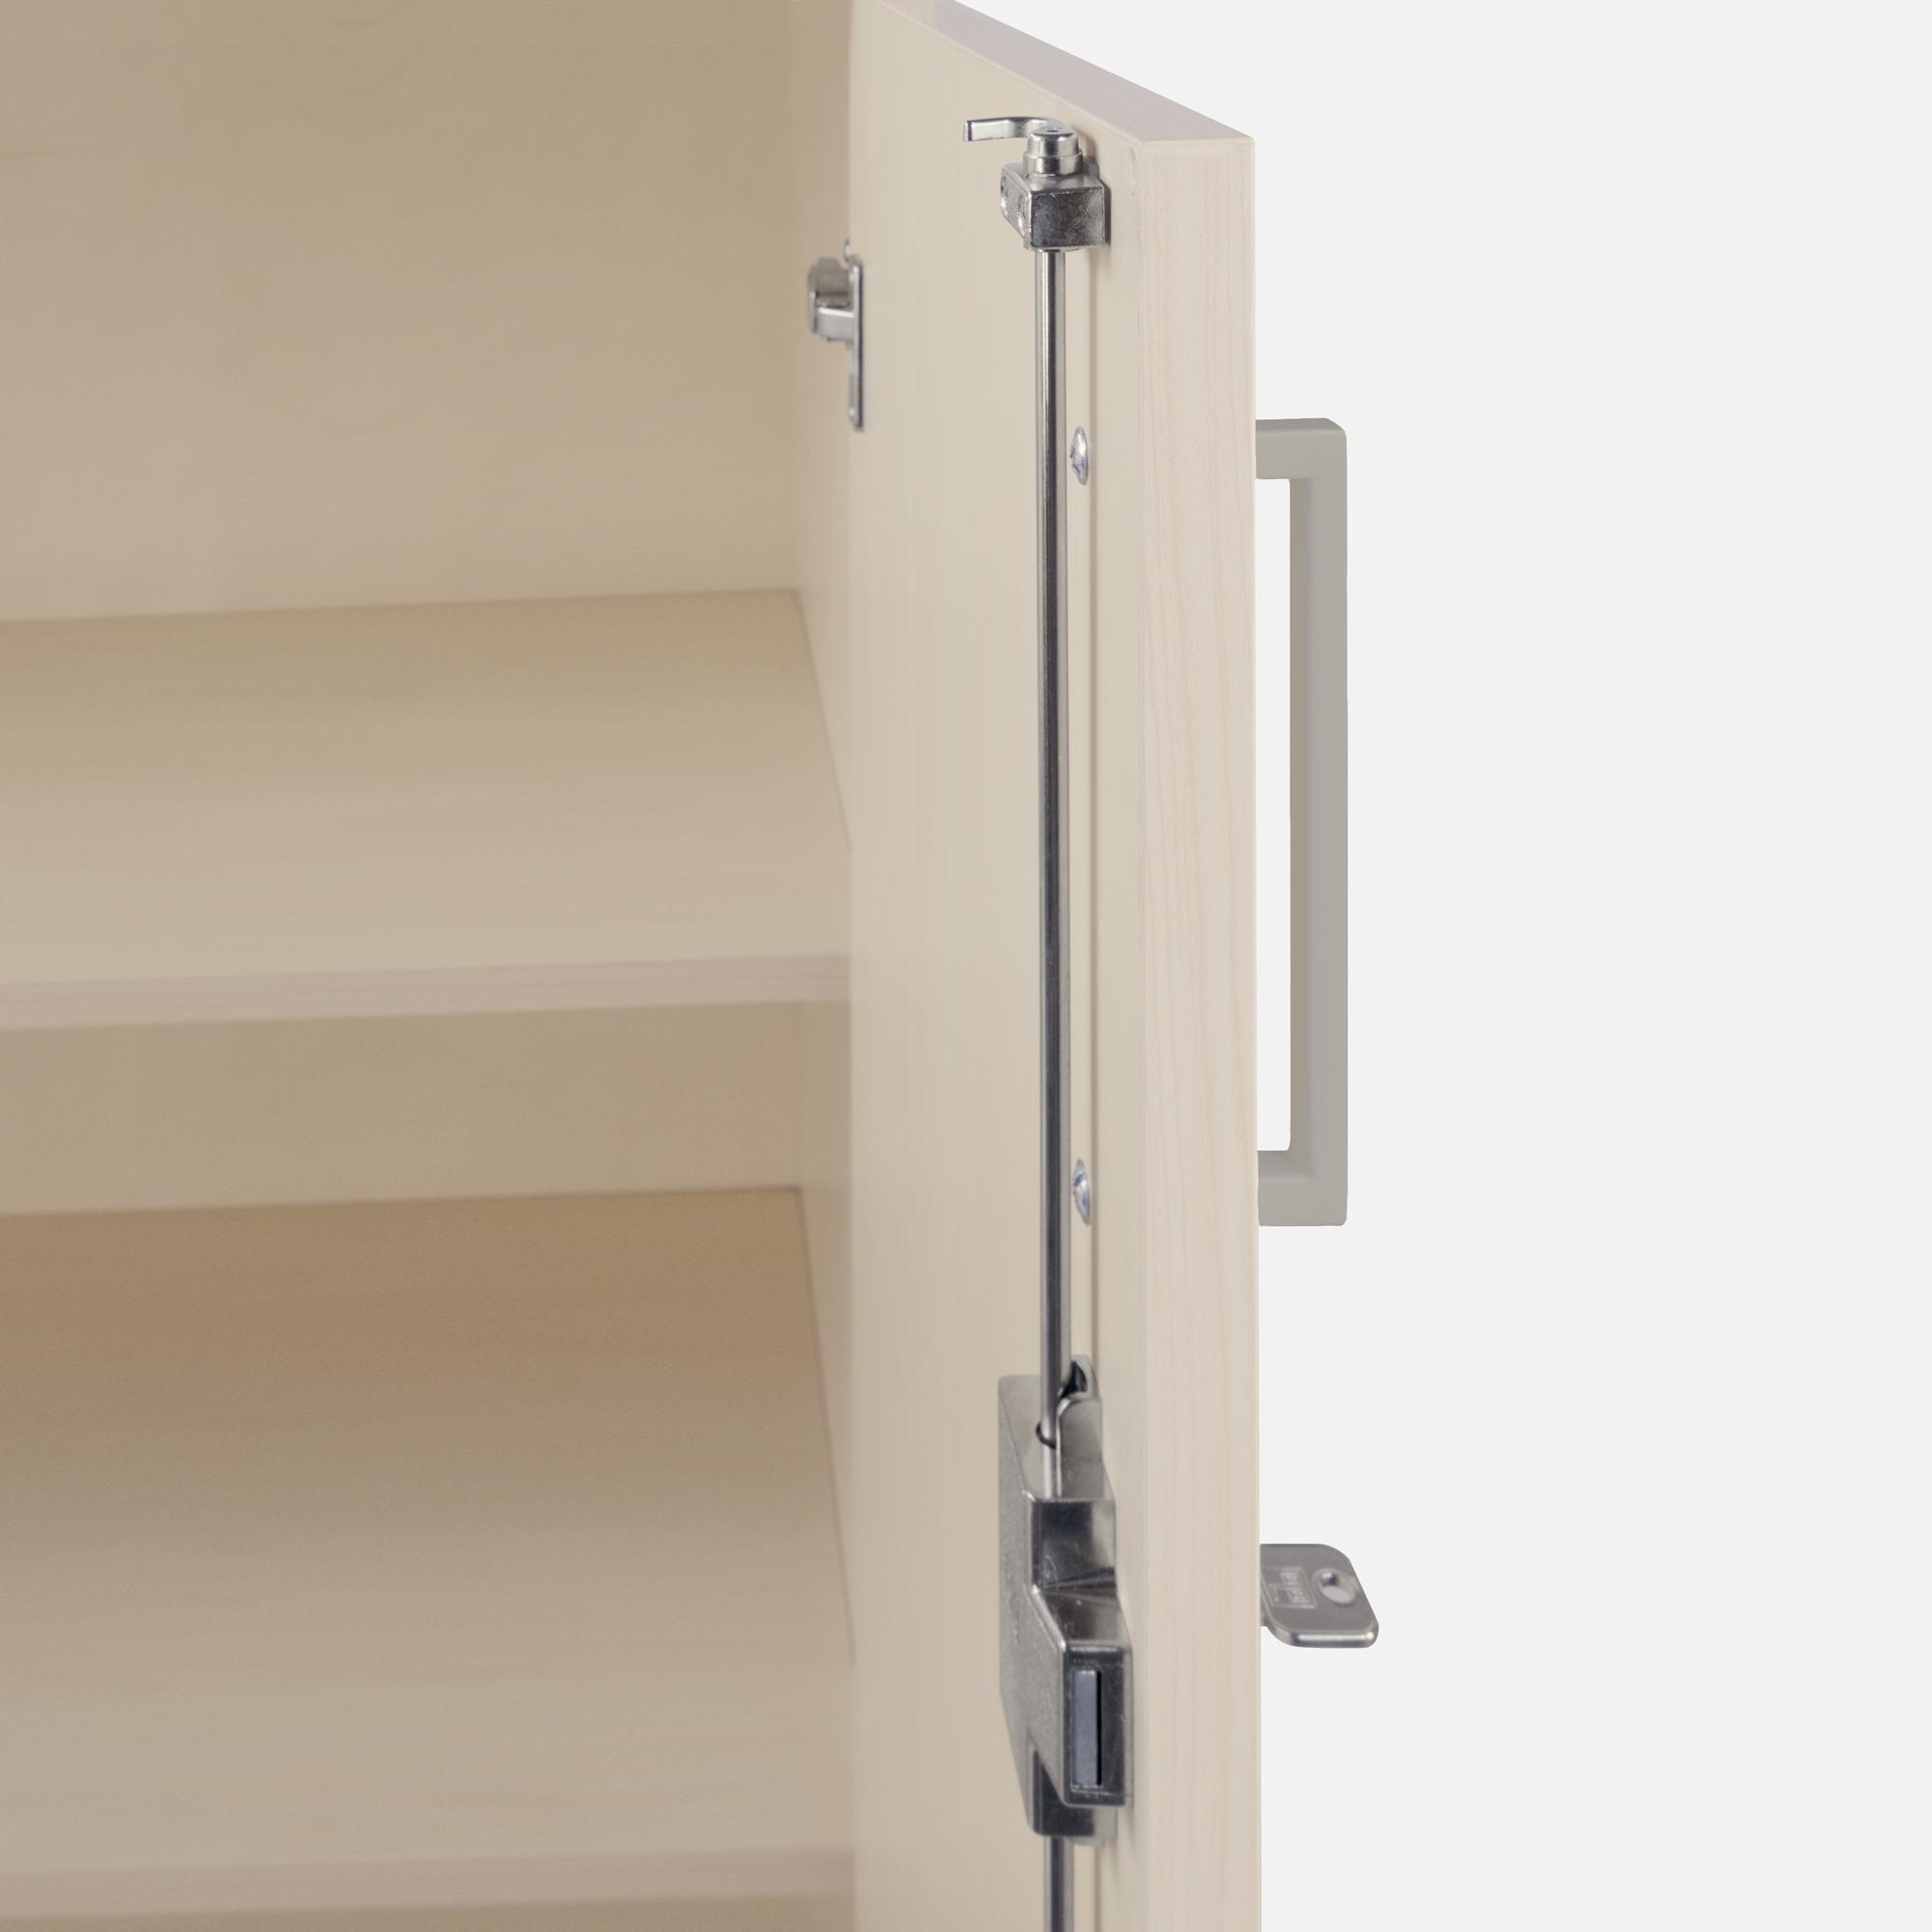 profi aktenschrank abschlie bar 3oh ahorn schrank. Black Bedroom Furniture Sets. Home Design Ideas